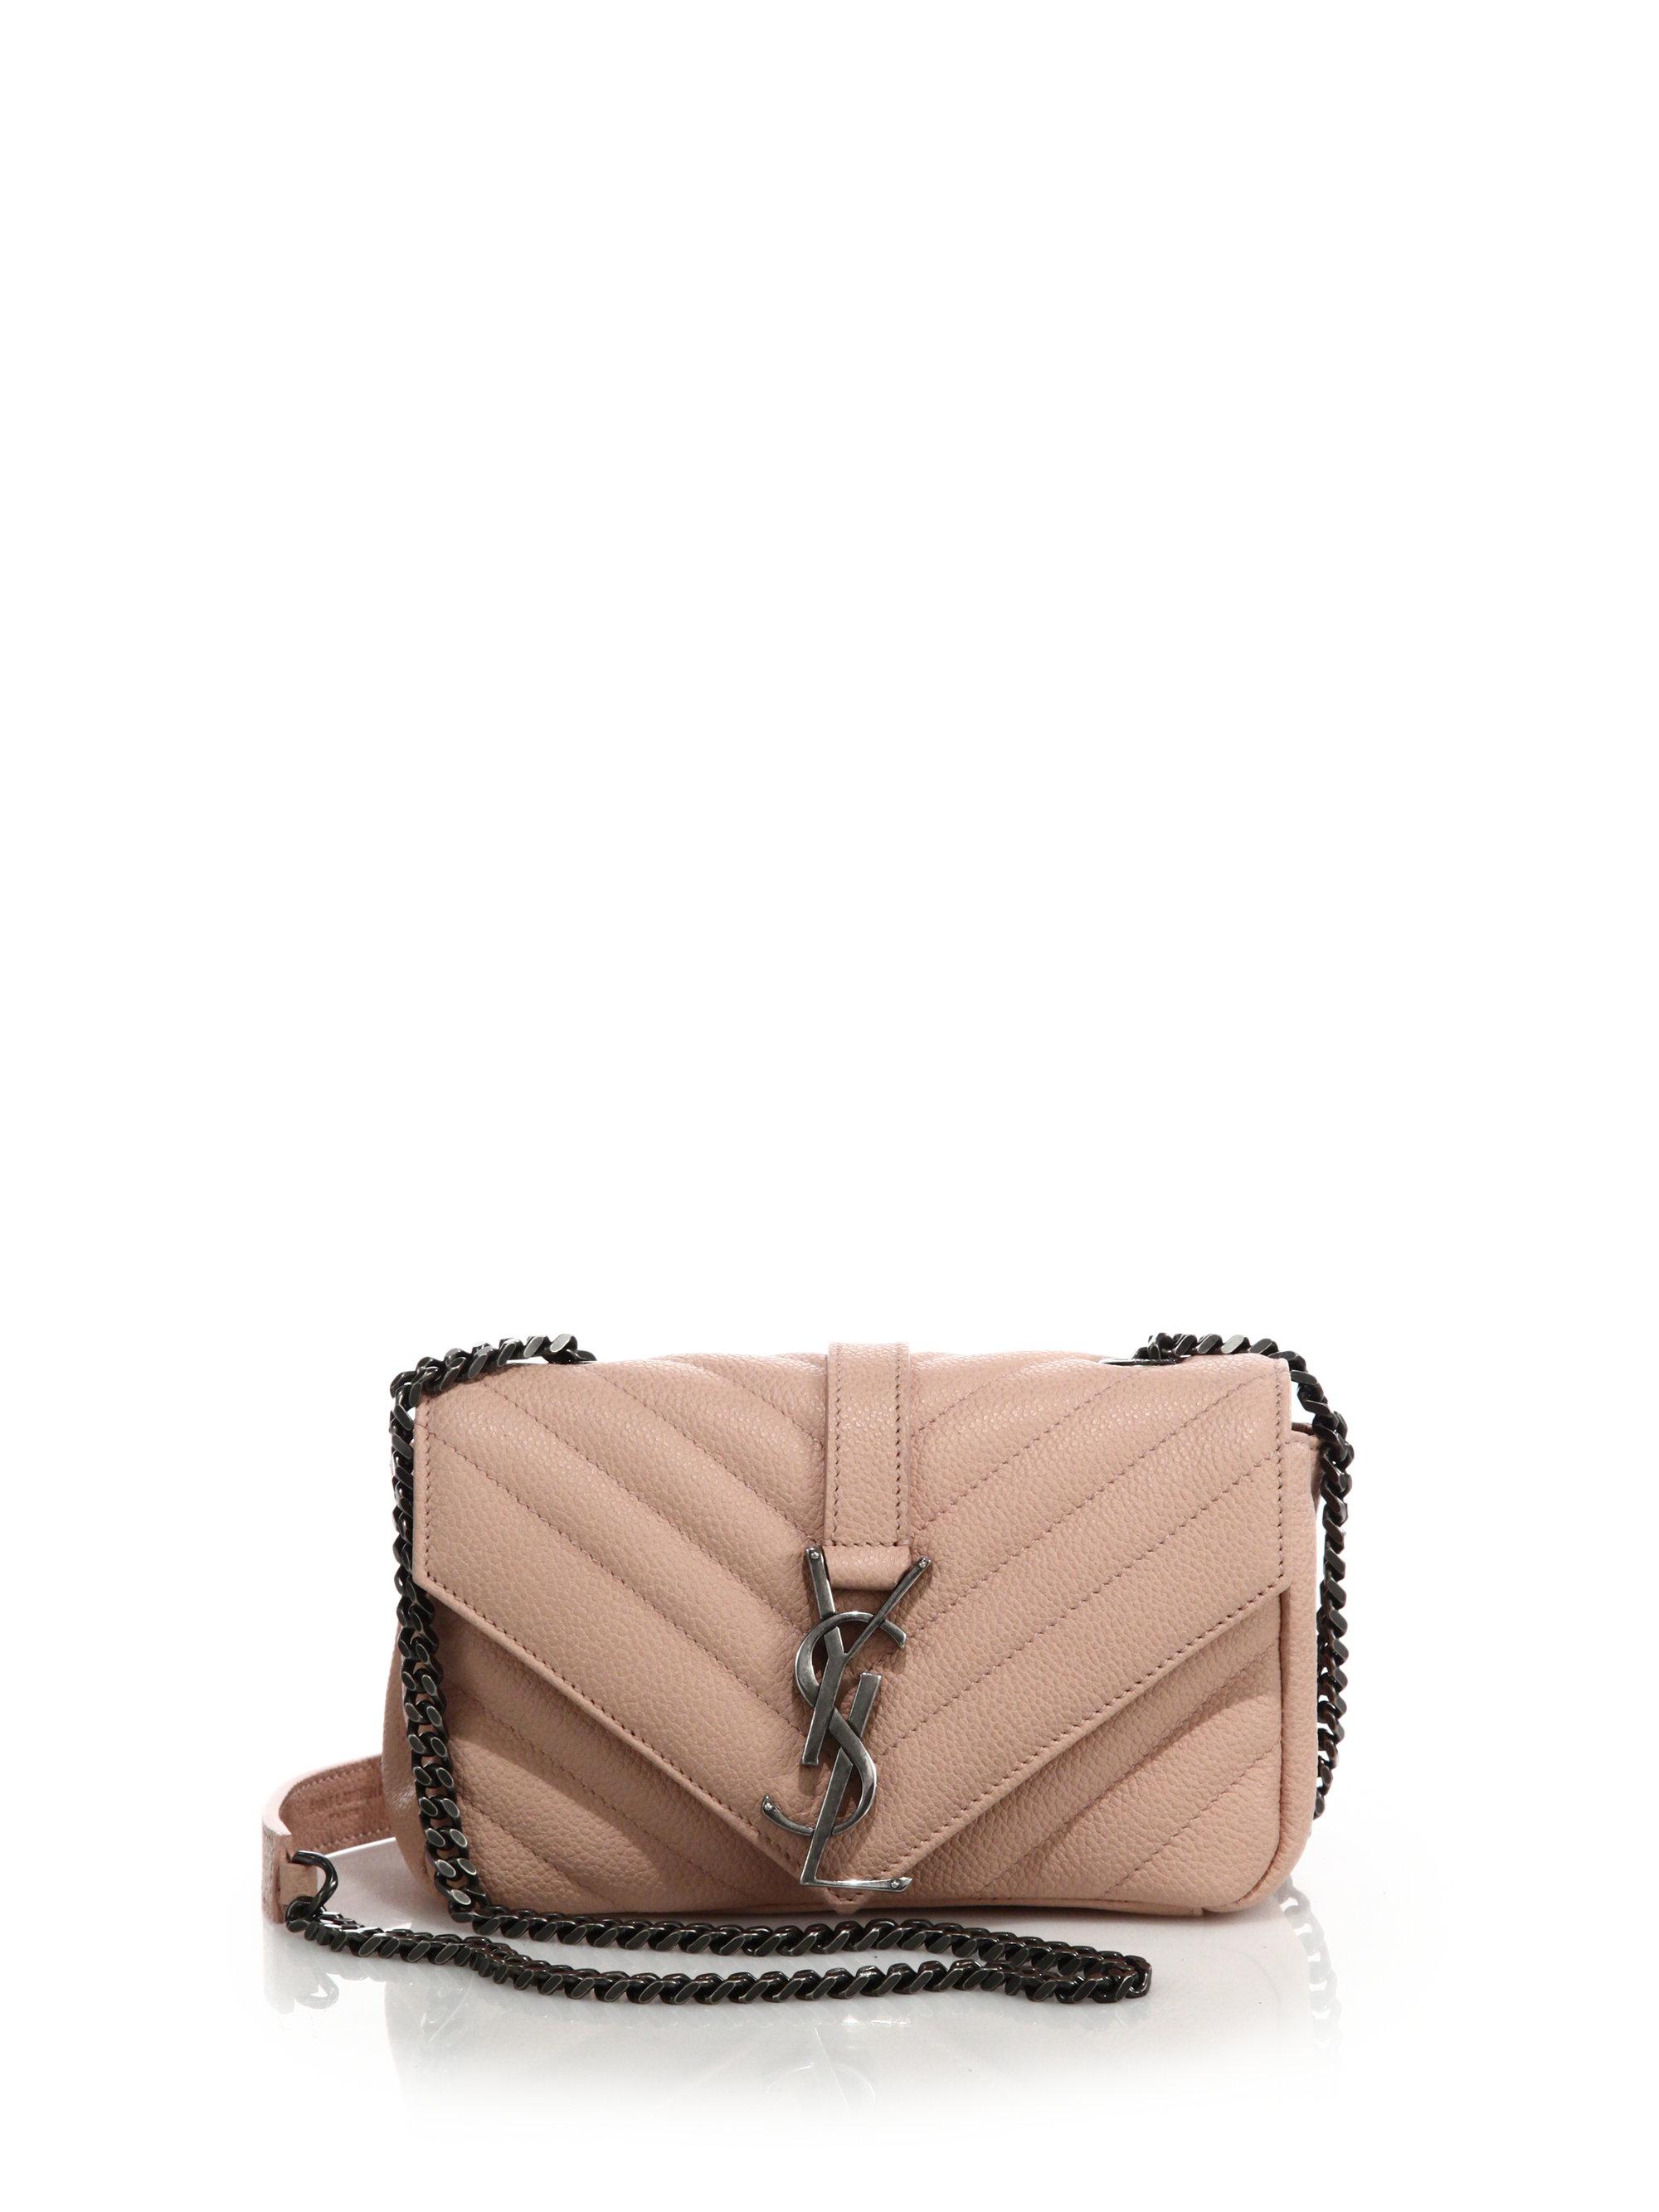 248999329757 Lyst - Saint Laurent Monogram Baby Matelasse Leather Crossbody Bag ...